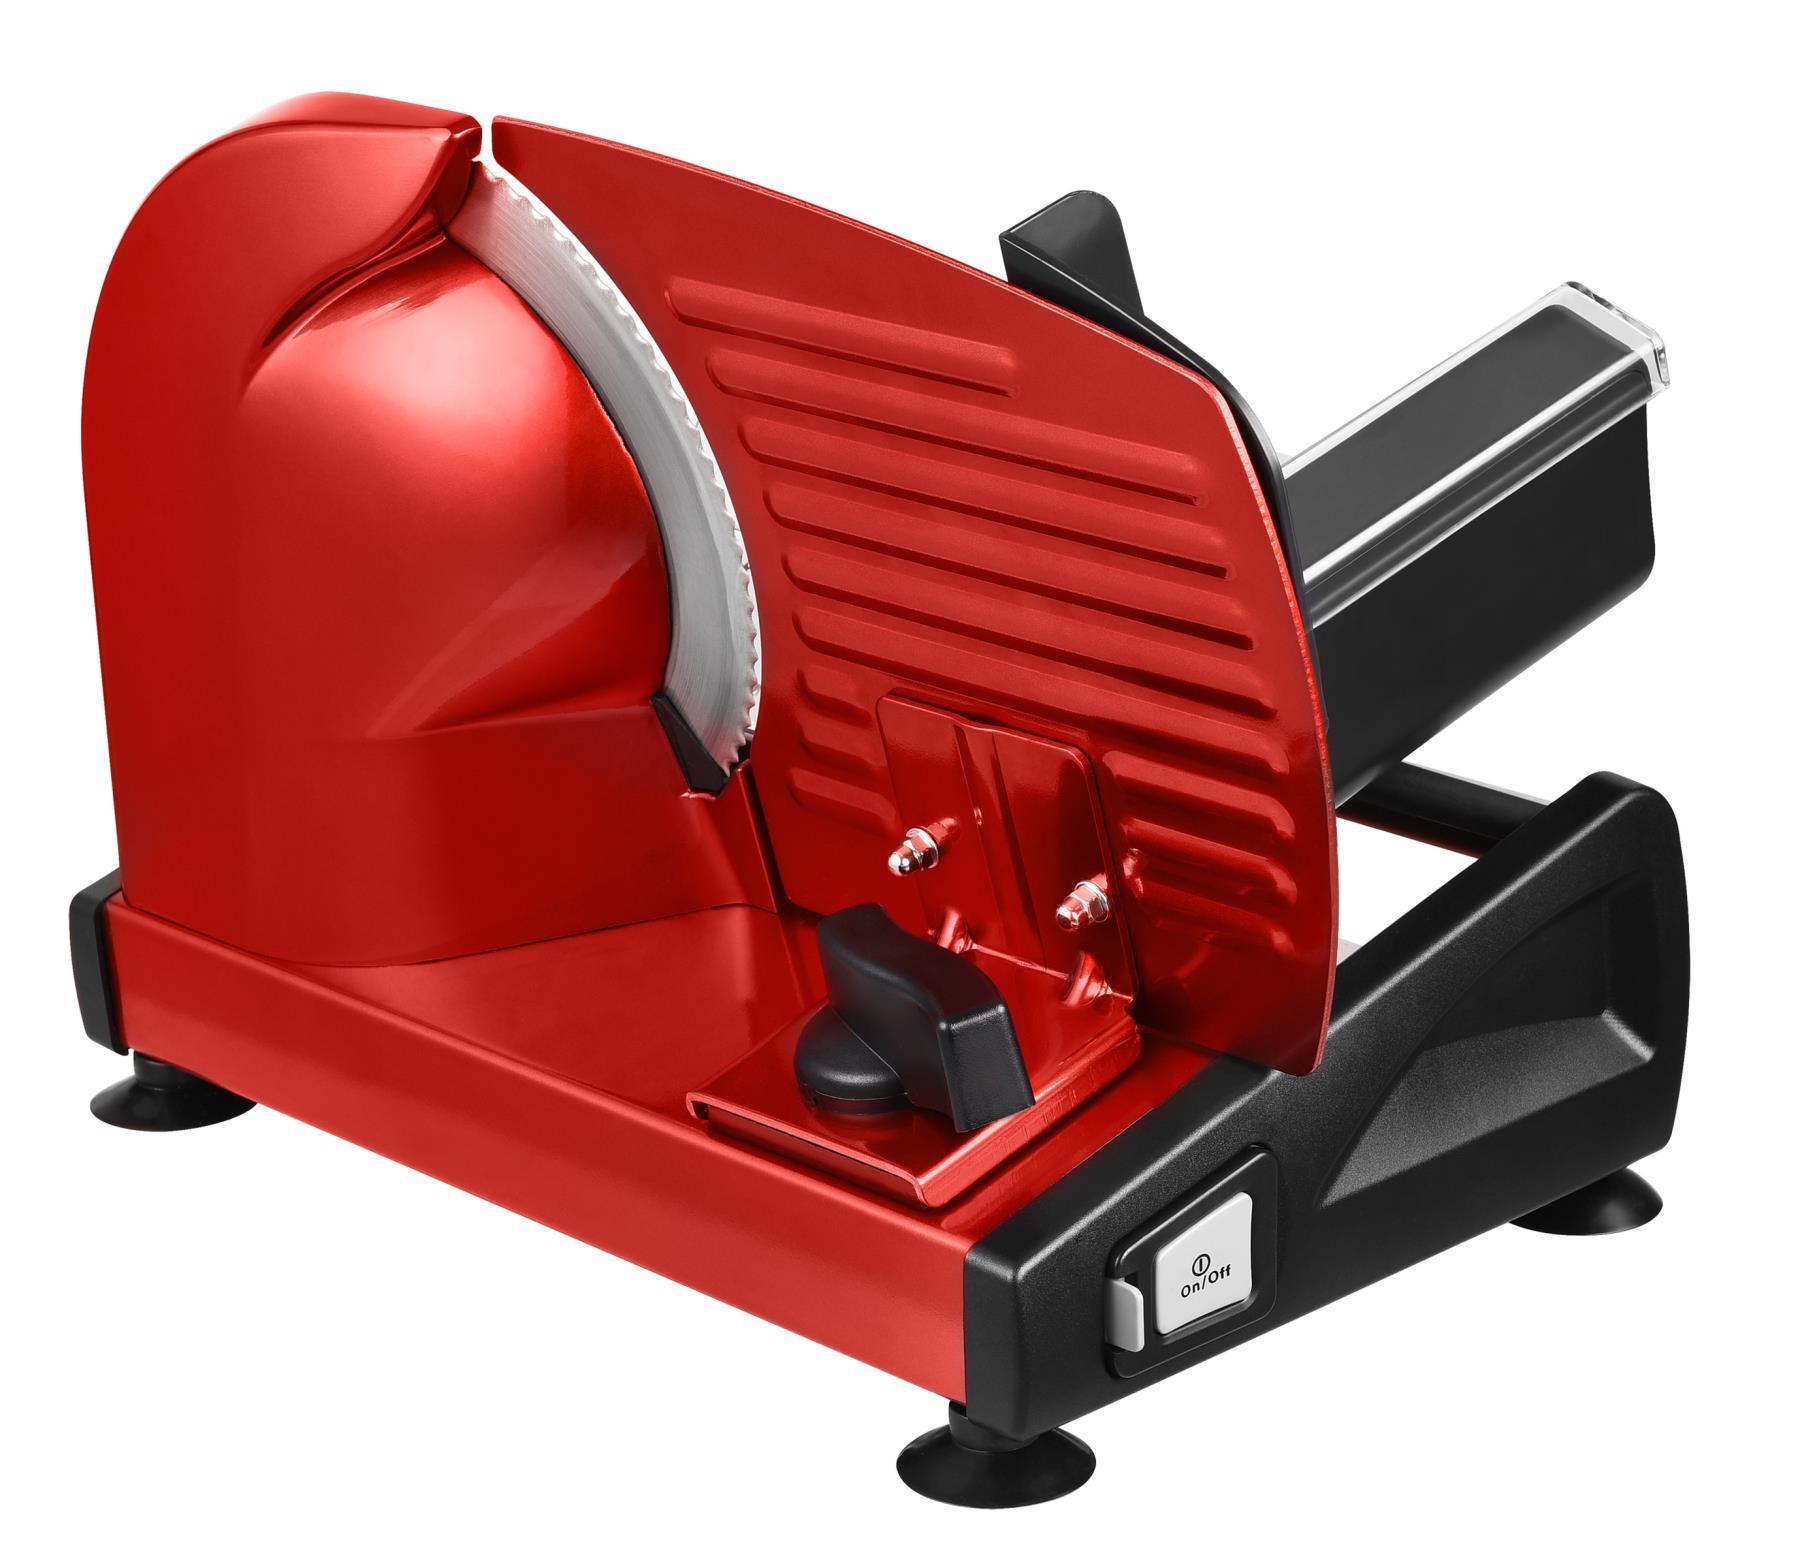 Metall Allesschneider Brotschneidemaschine Edelstahlmesser 19cm Rot*80381 Bild 3